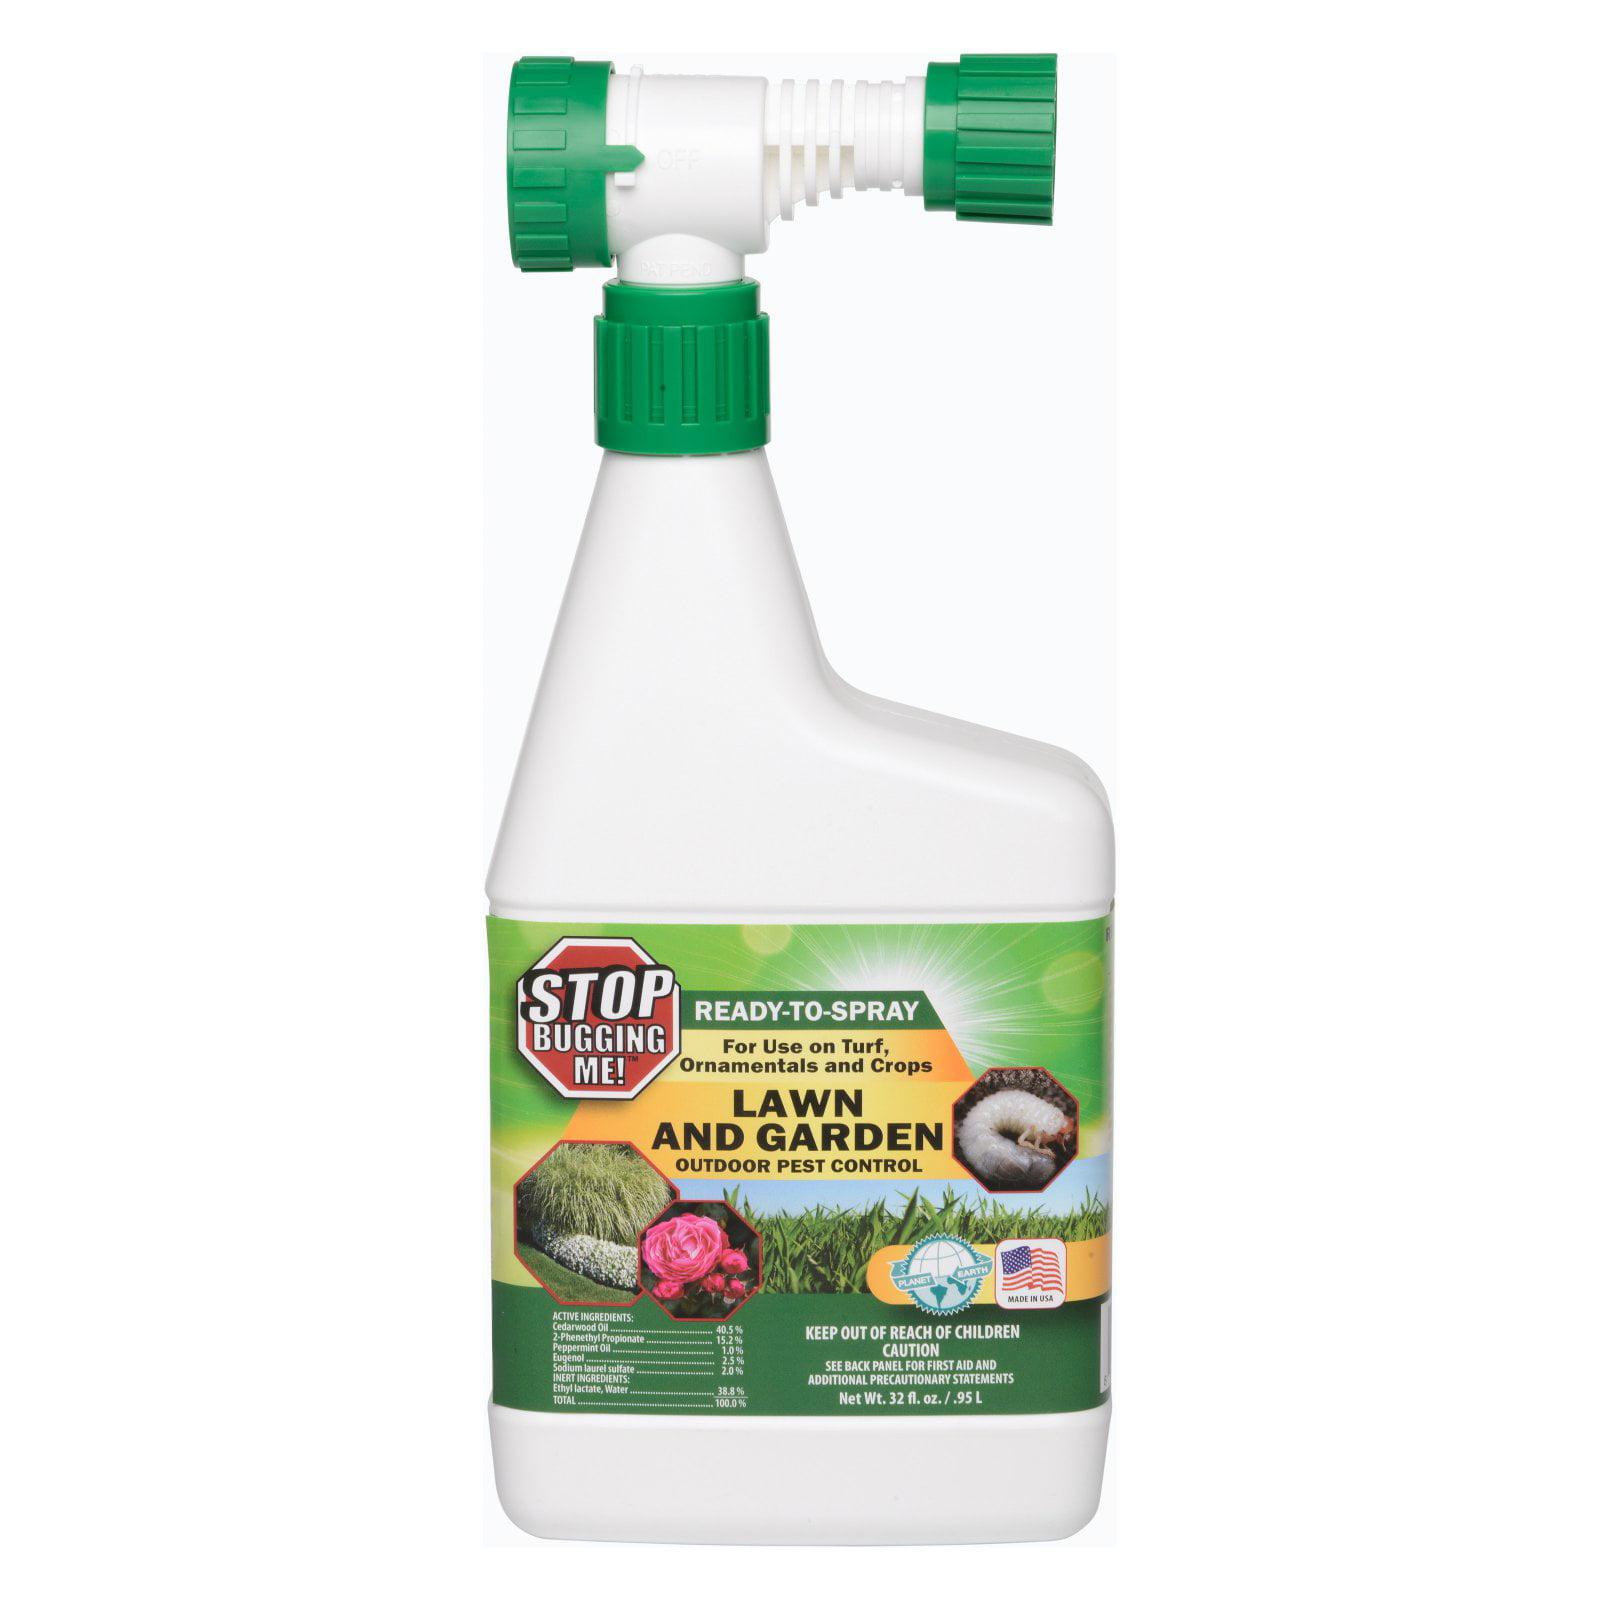 Stop Bugging Me 32 oz. Lawn ; Garden Pest Control Concent...